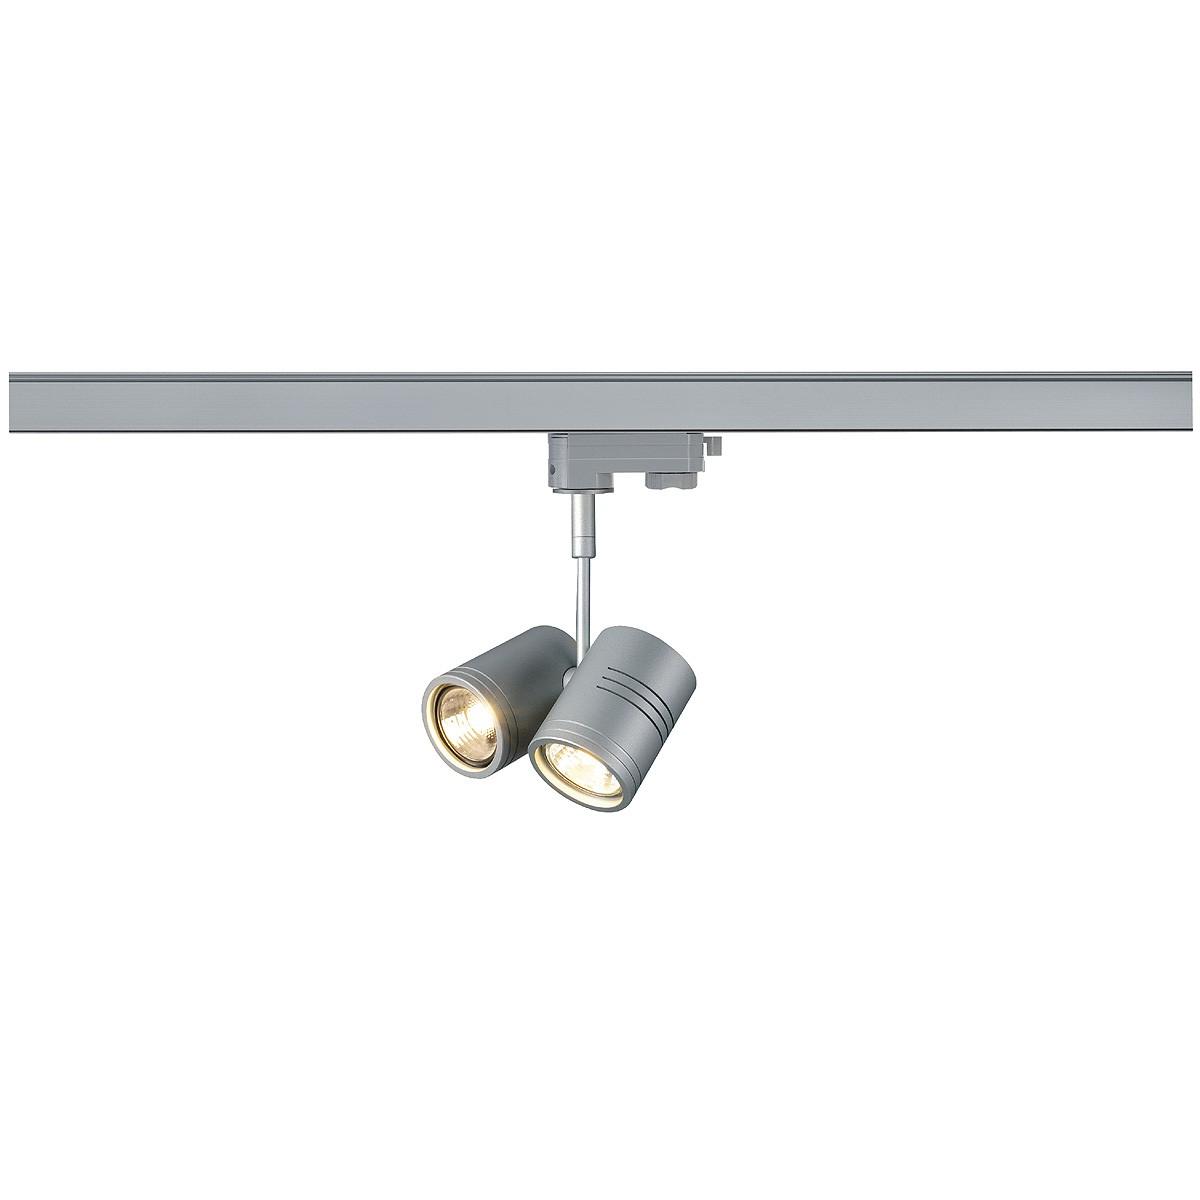 SLV светильники 5